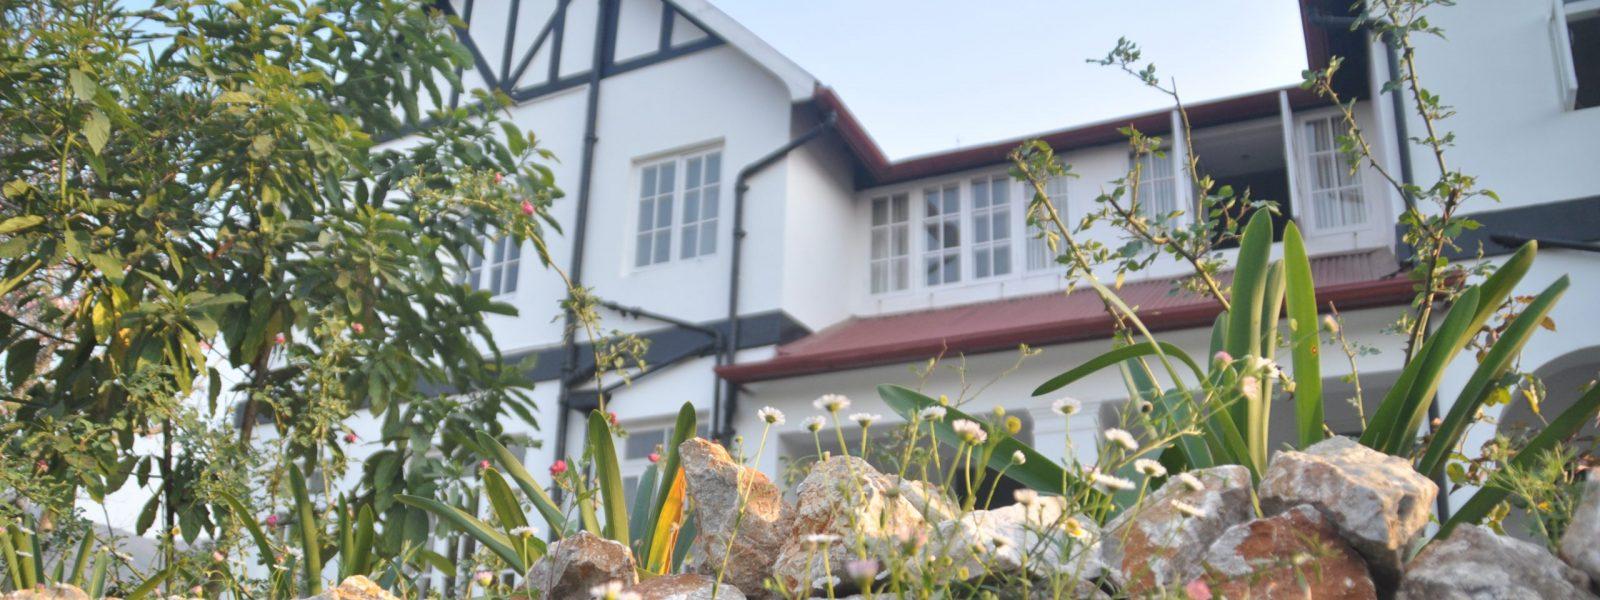 A Natural Thing - exterior - Myanmar - Sampan Travel